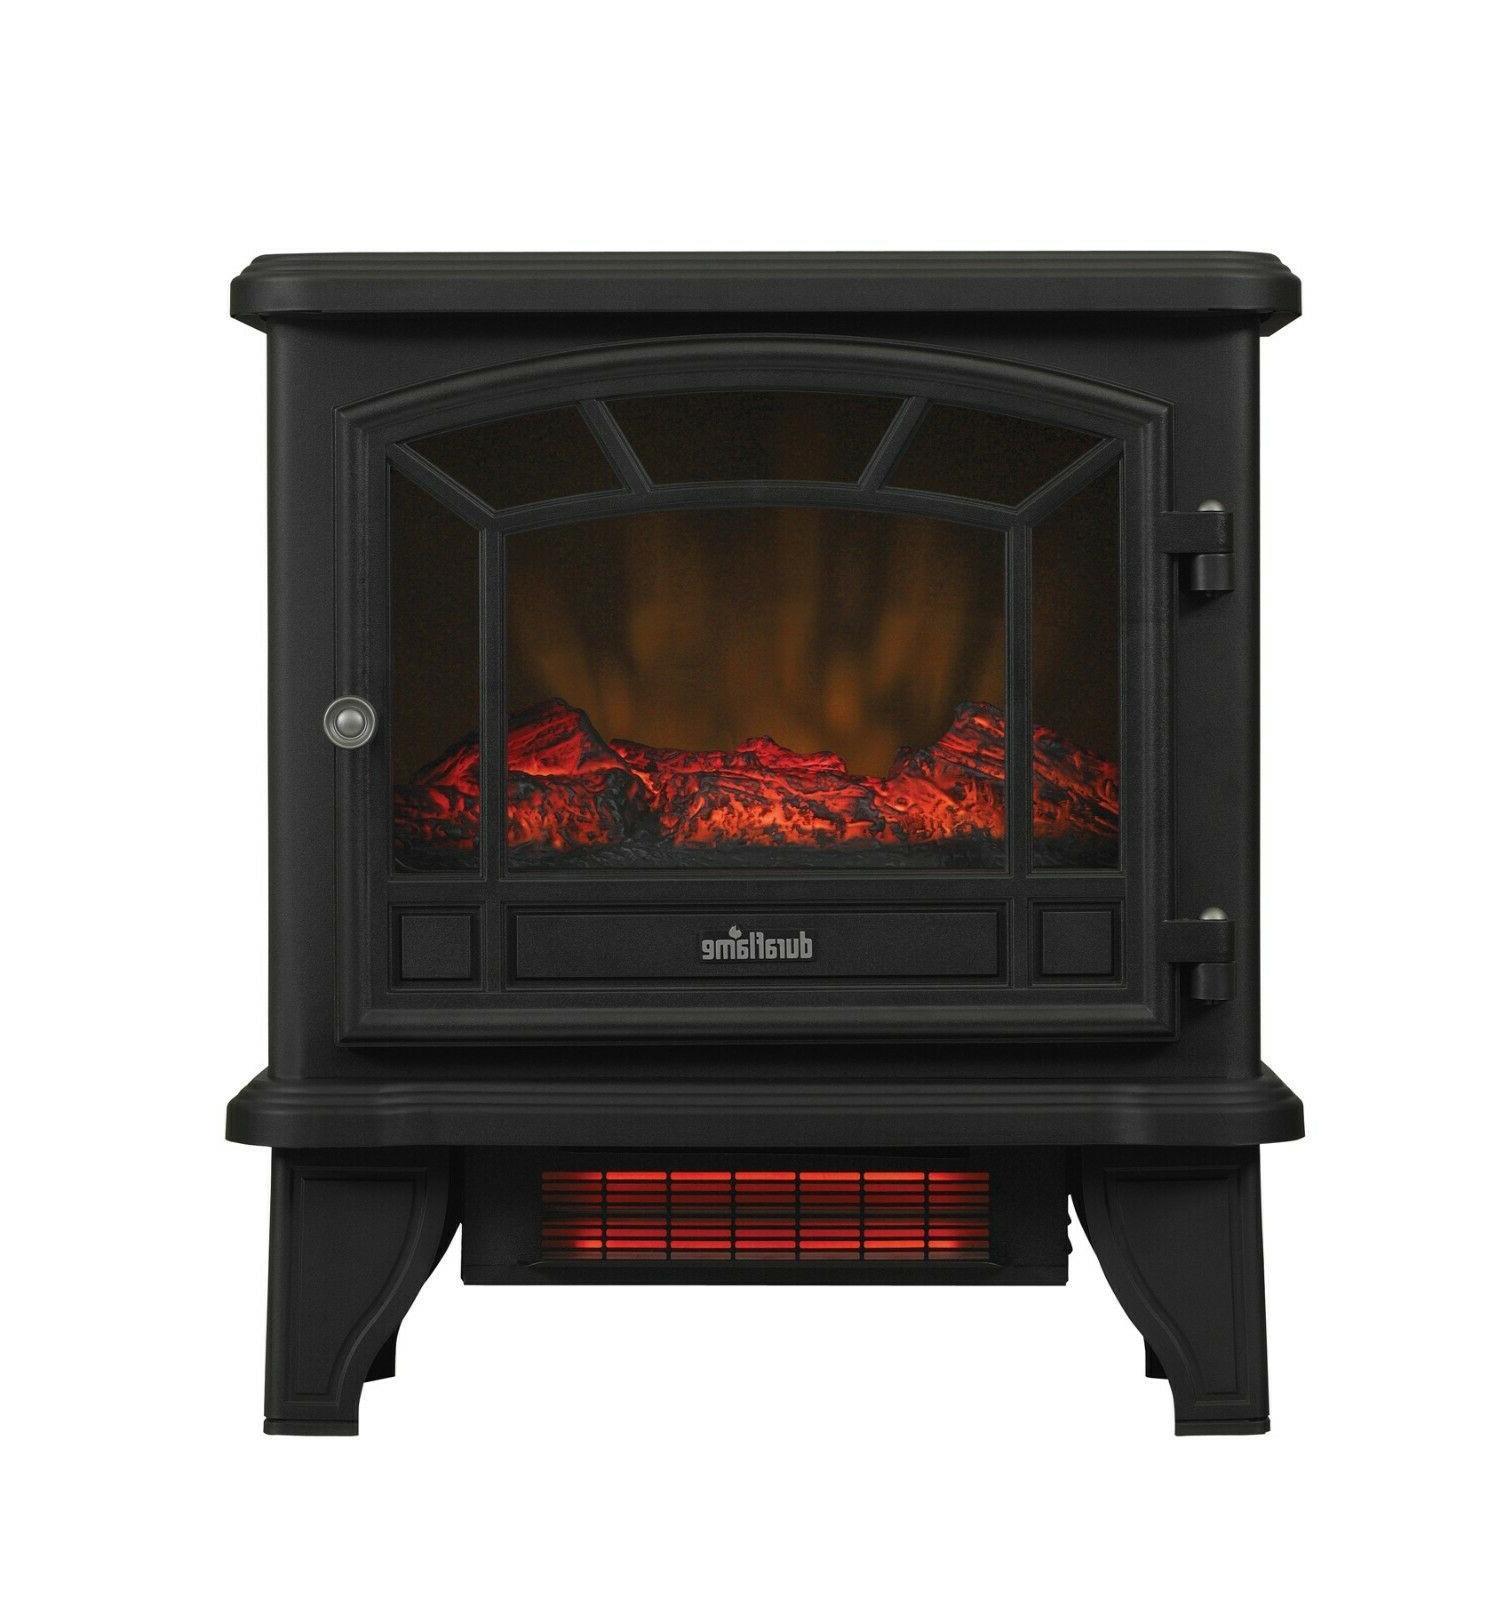 Infrared Freestanding Electric Stove Heater Quartz 5200 BTU